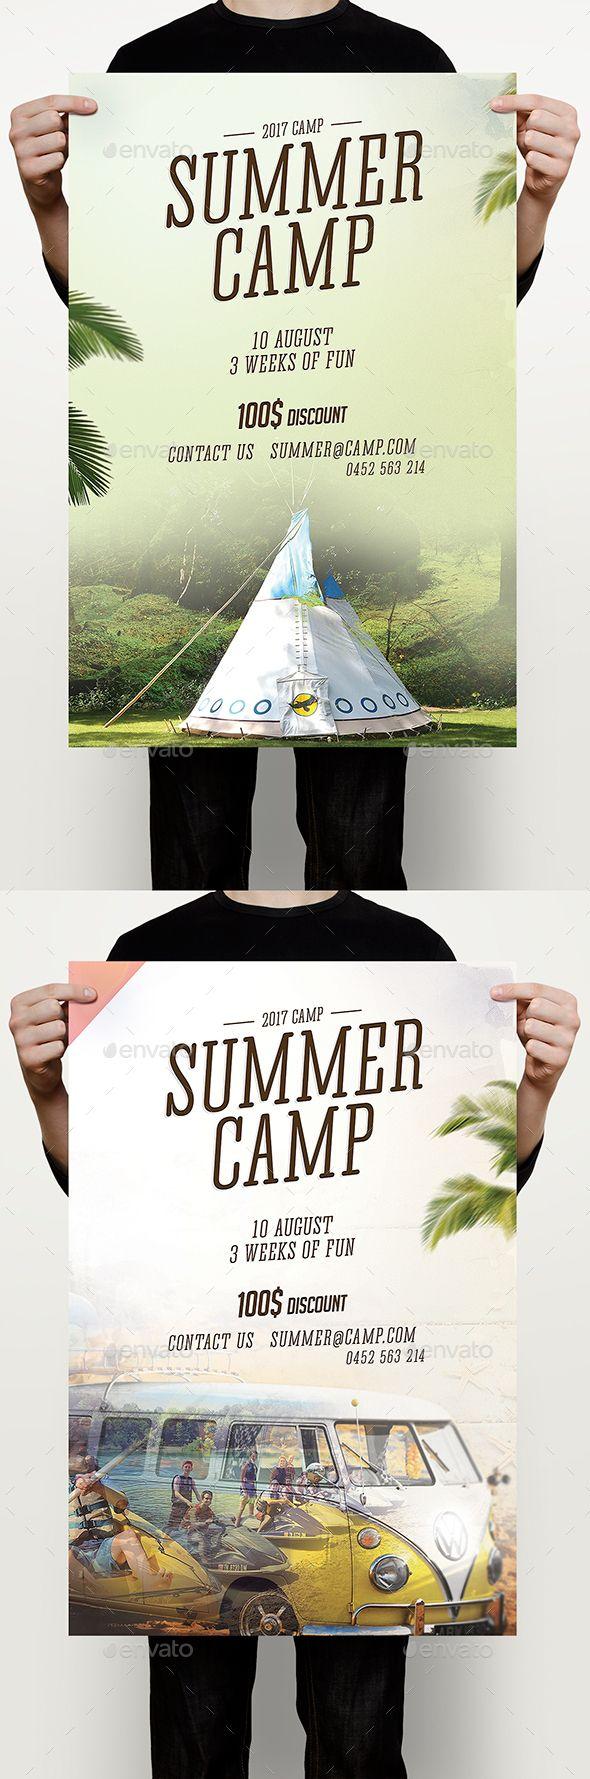 Summer Camp Flyer Template PSD. Download here: http://graphicriver.net/item/summer-camp-flyer/16830210?ref=ksioks